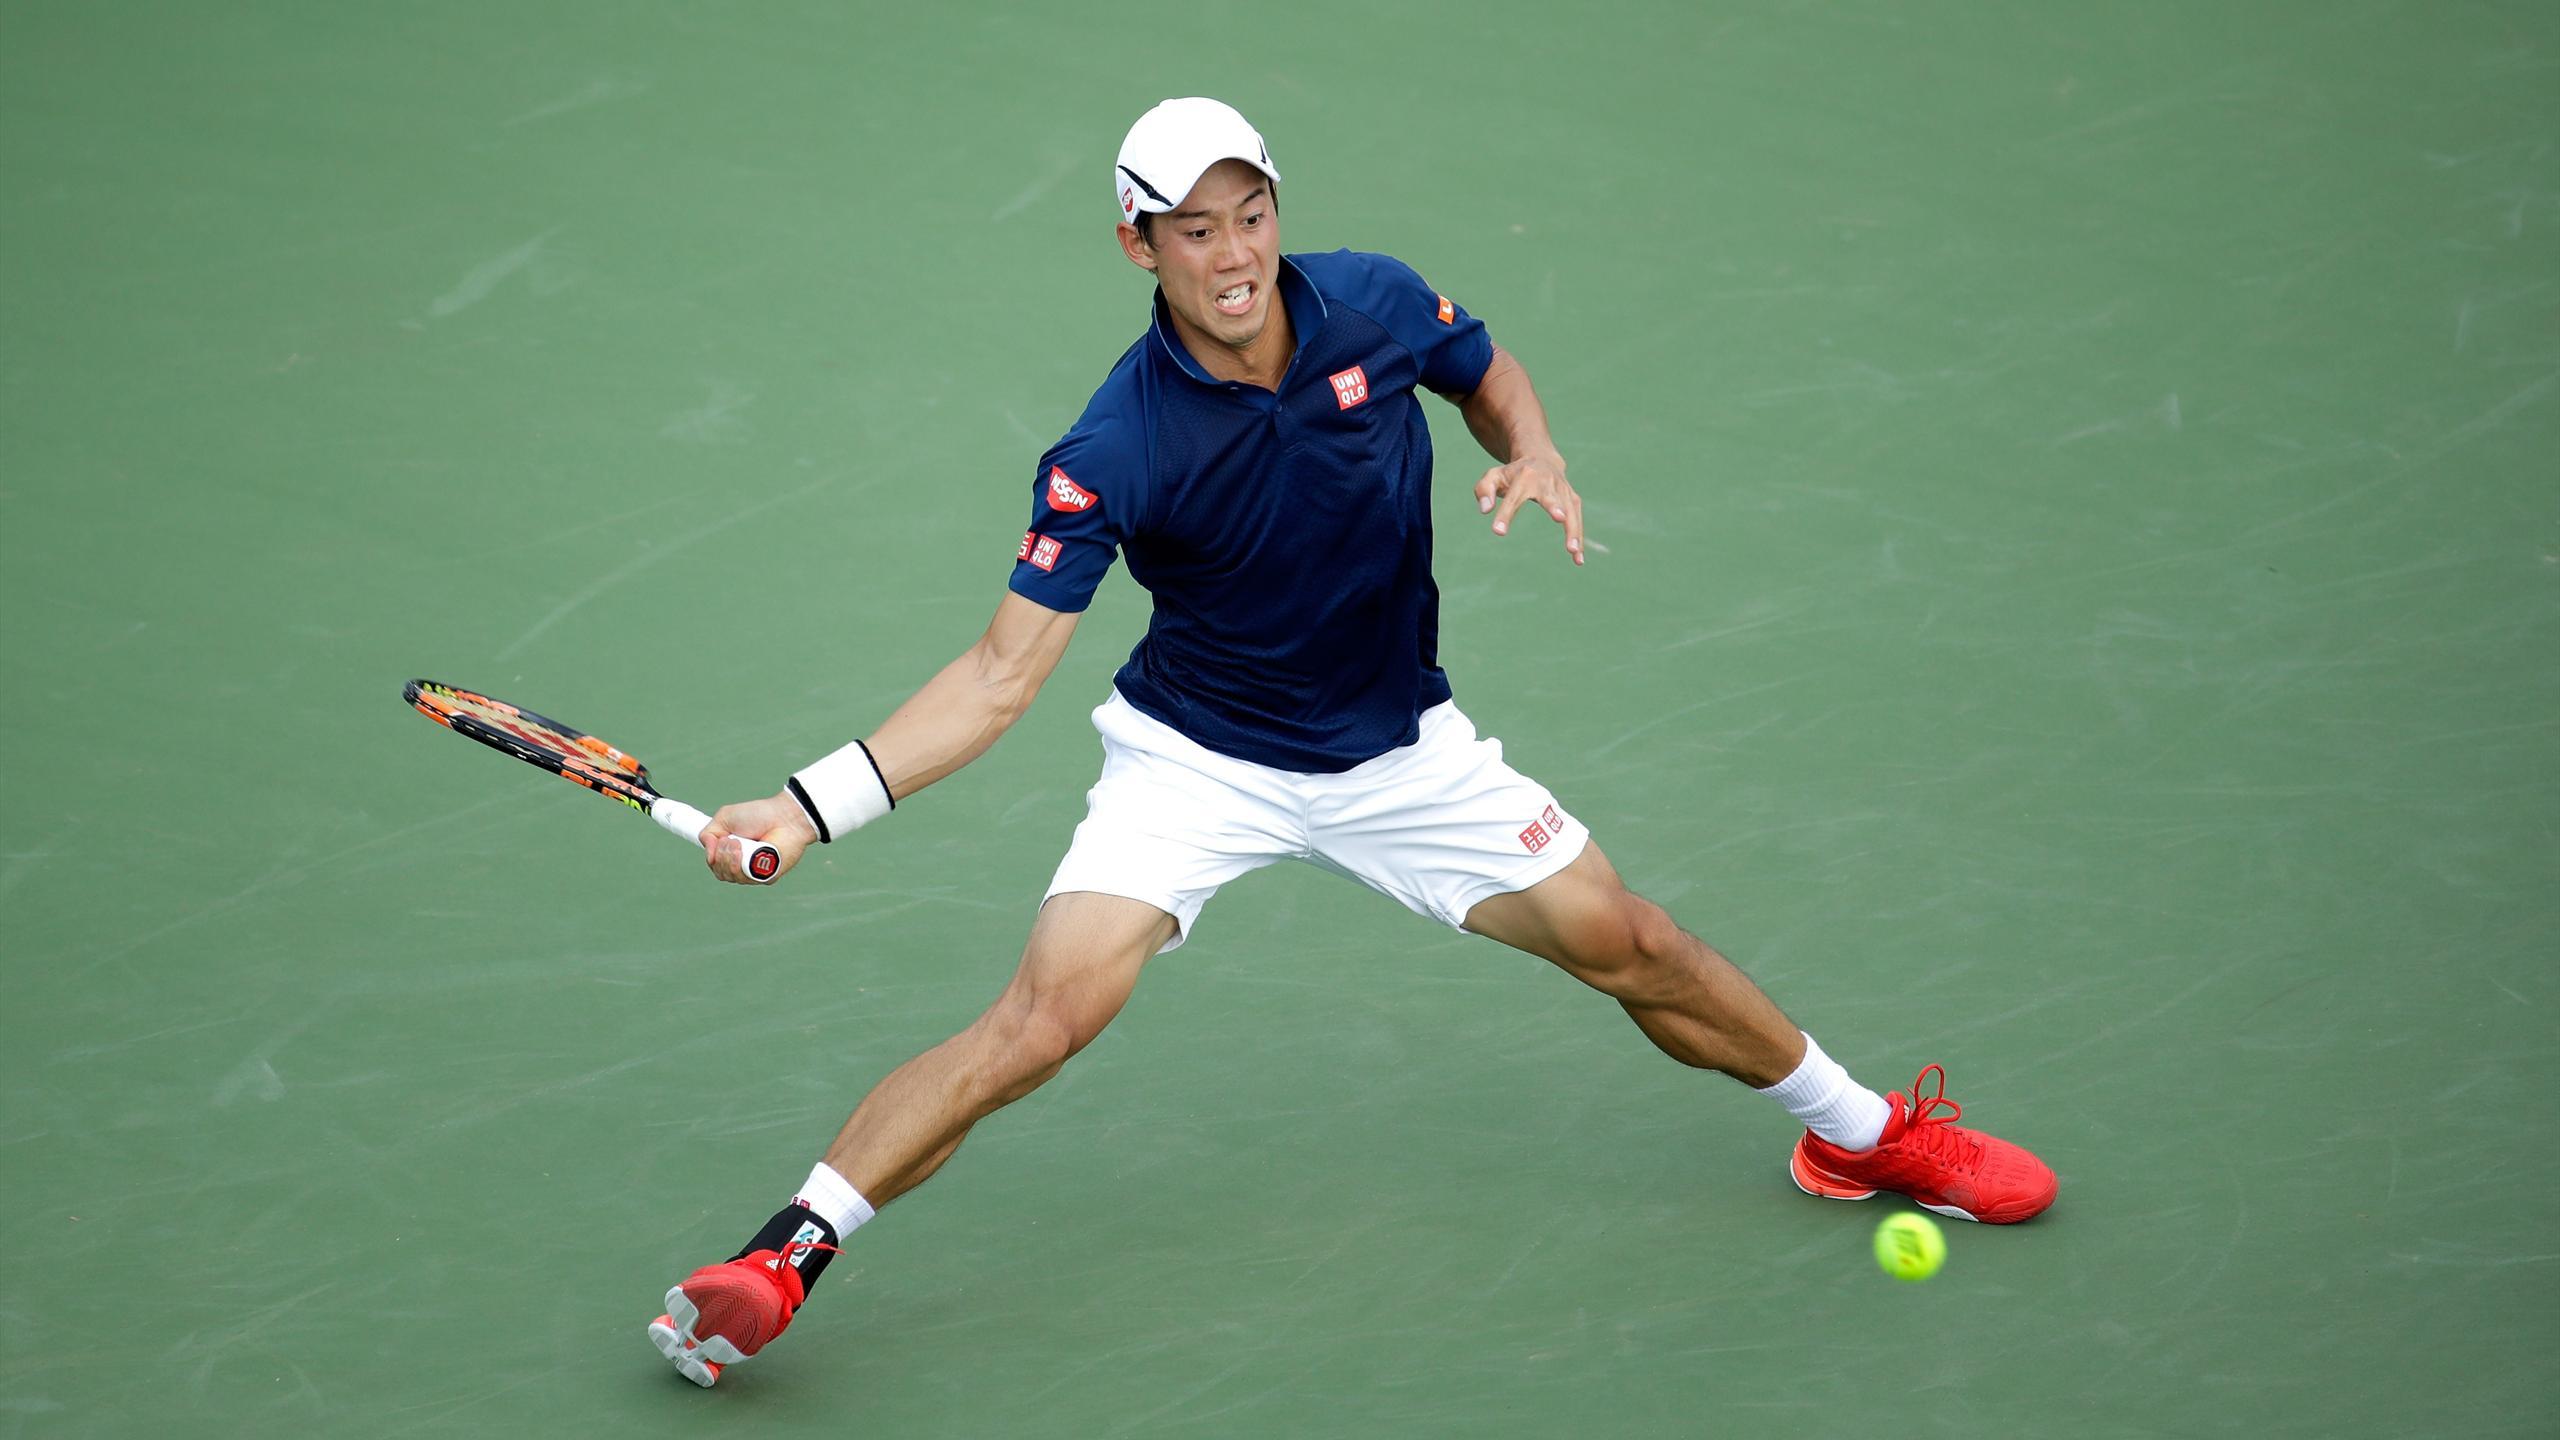 Kei Nishikori hits a return during his third round match against Bernard Tomic